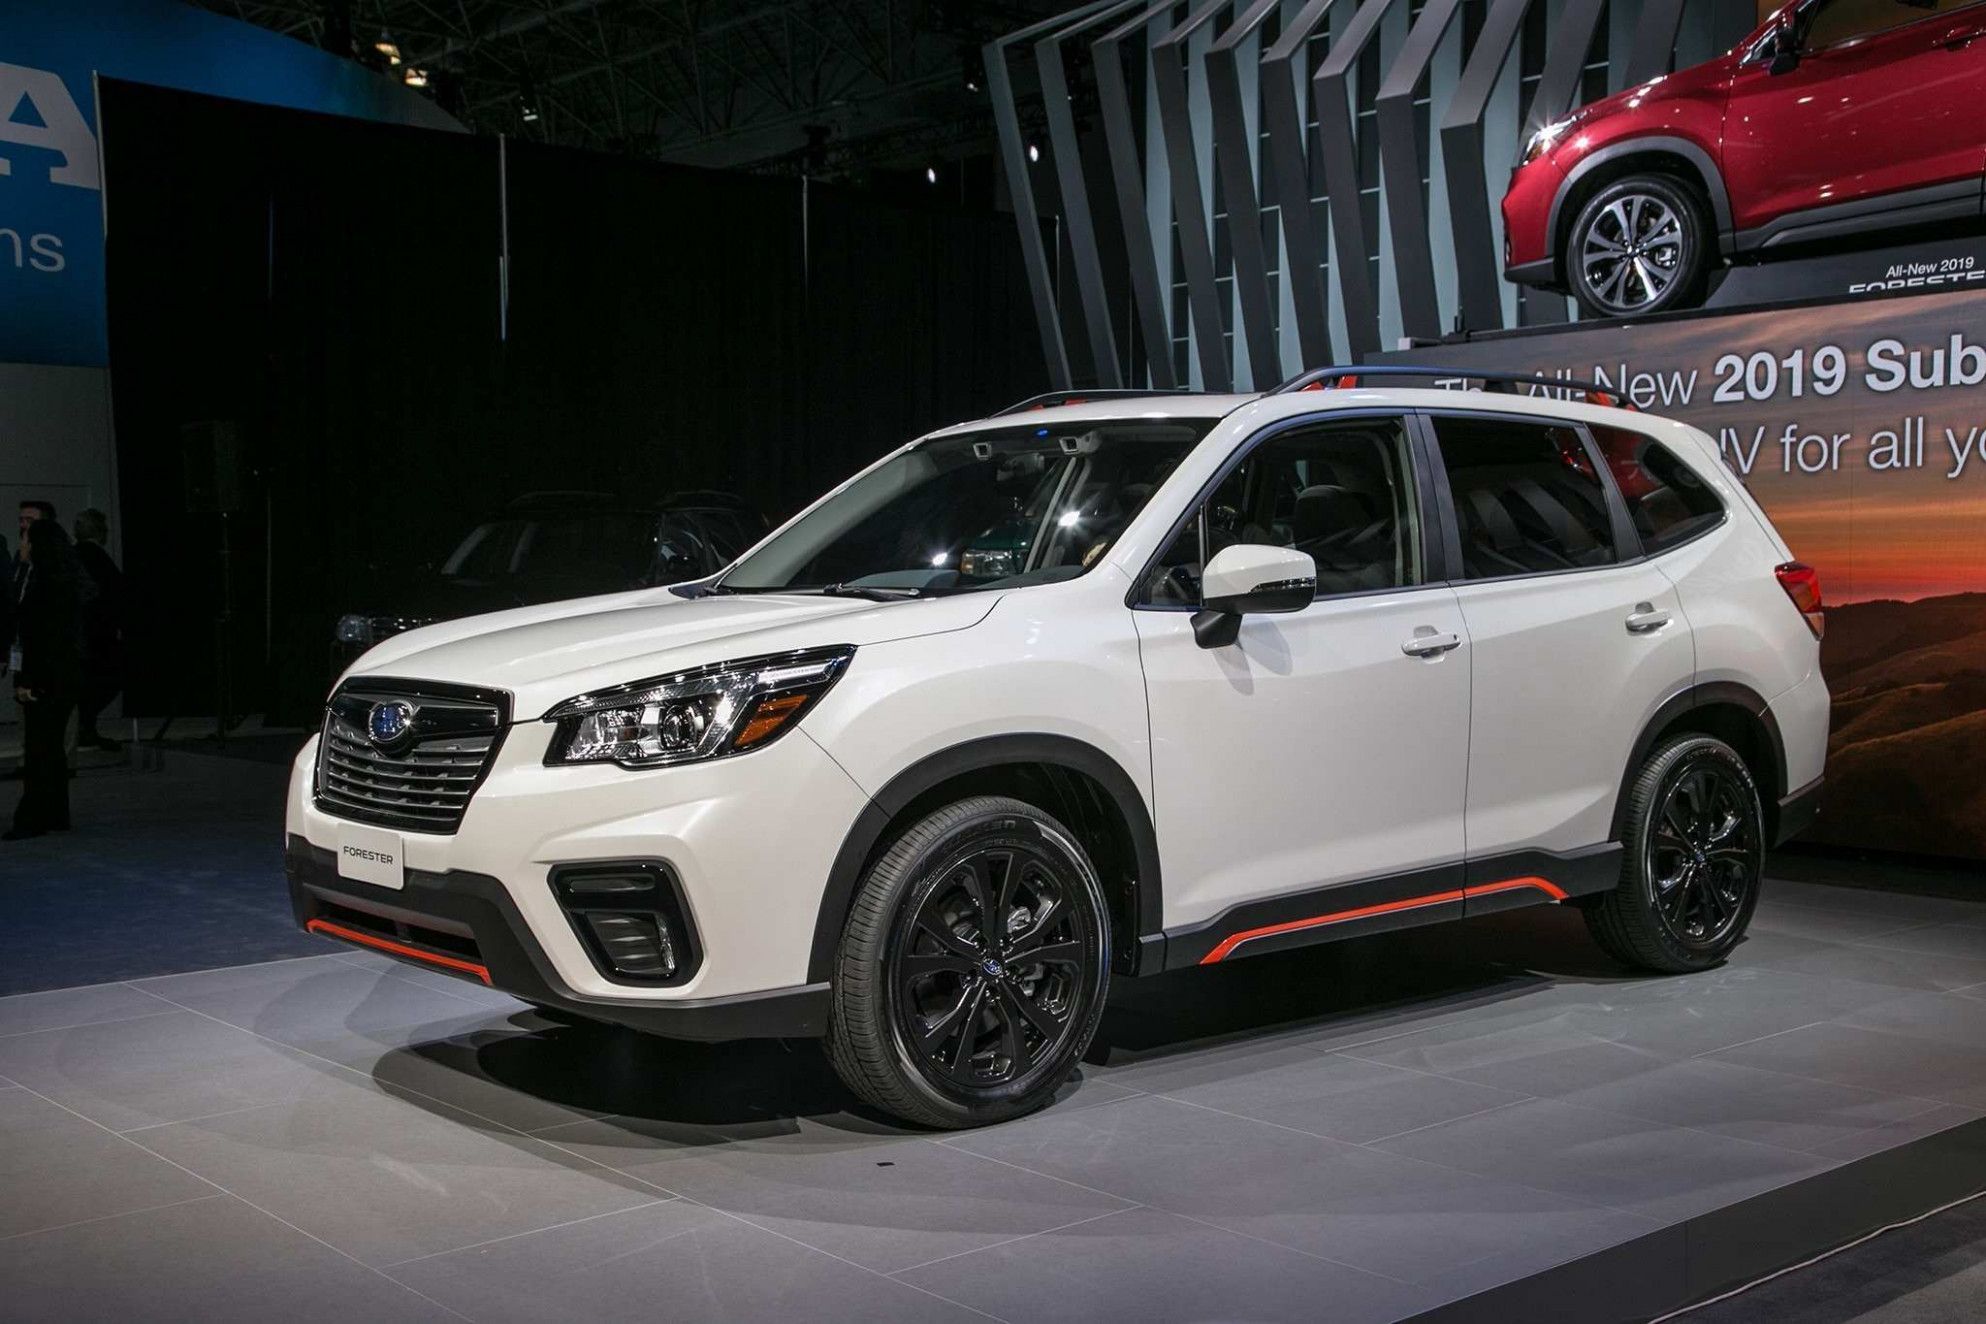 6 Wallpaper 2020 Subaru Forester Towing Capacity In 2020 Subaru Forester Subaru Subaru Outback